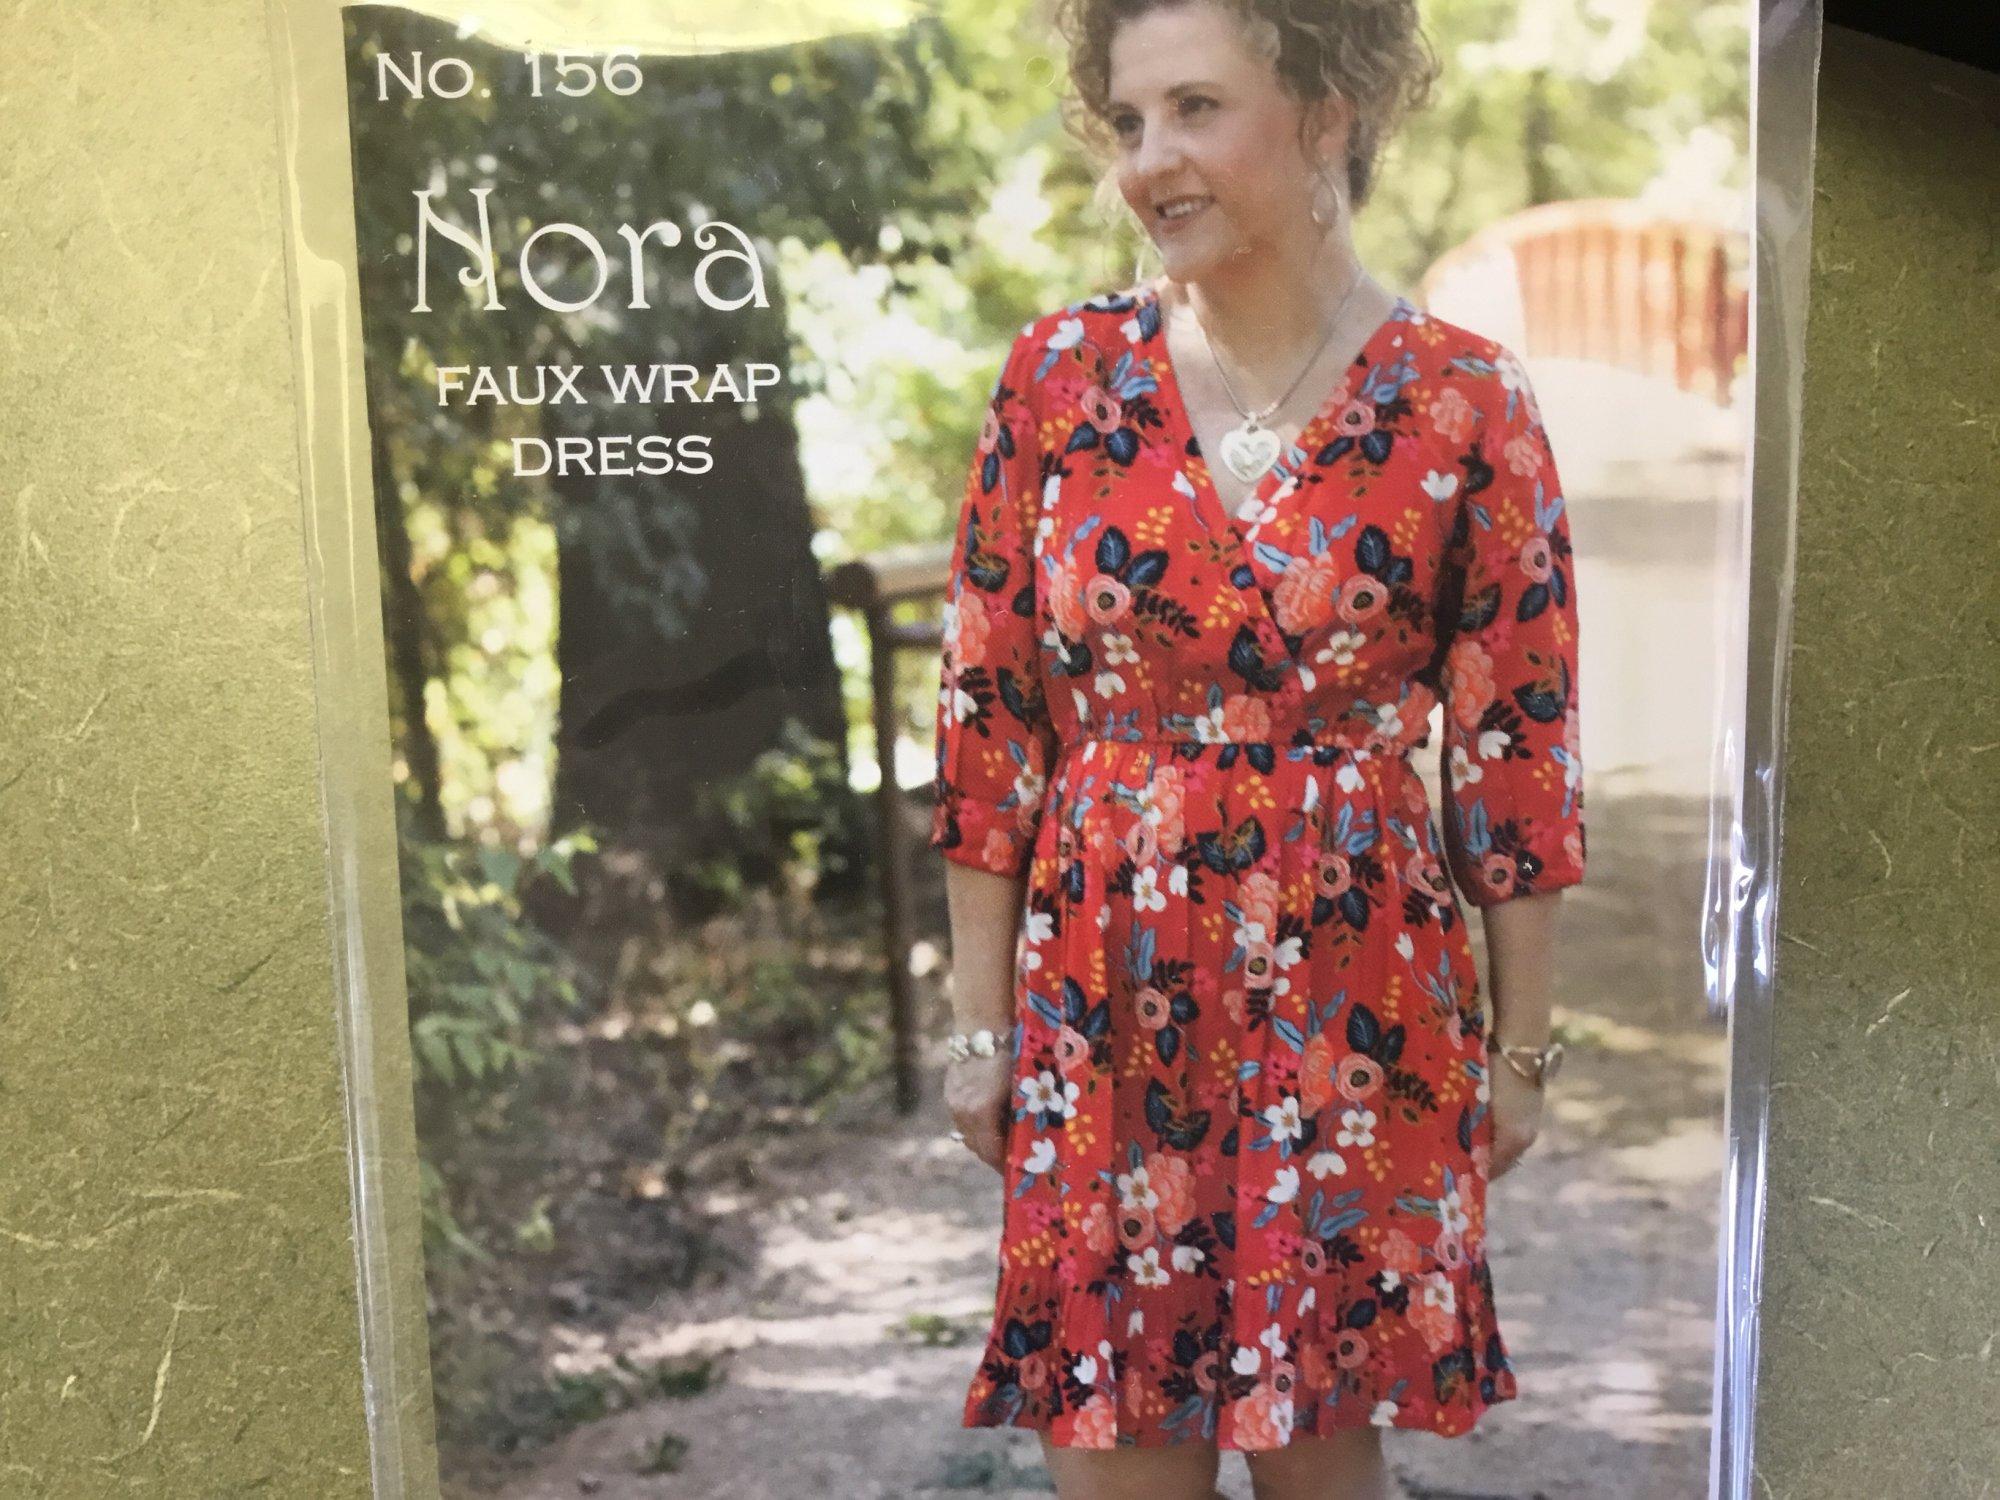 NORA FAUX WRAP DRESS PATTERN by Serendipity Studio 156